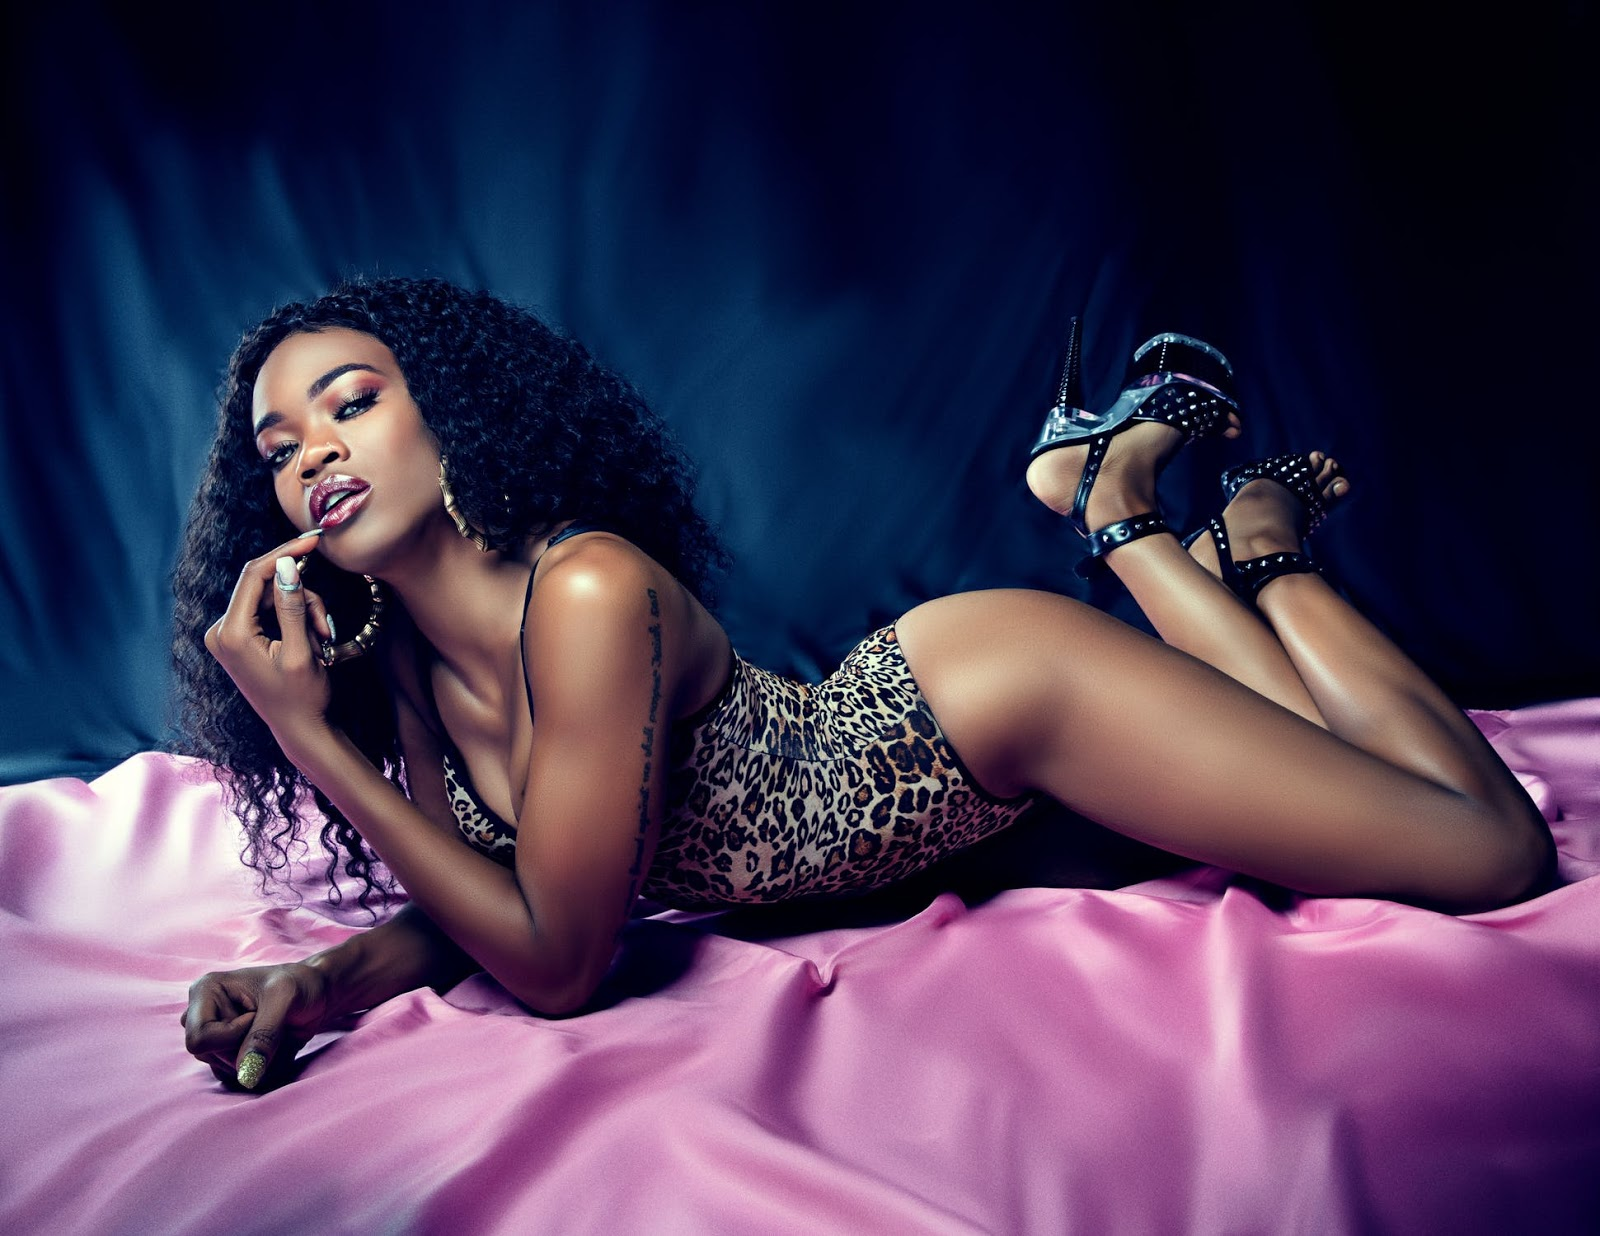 black hot woman